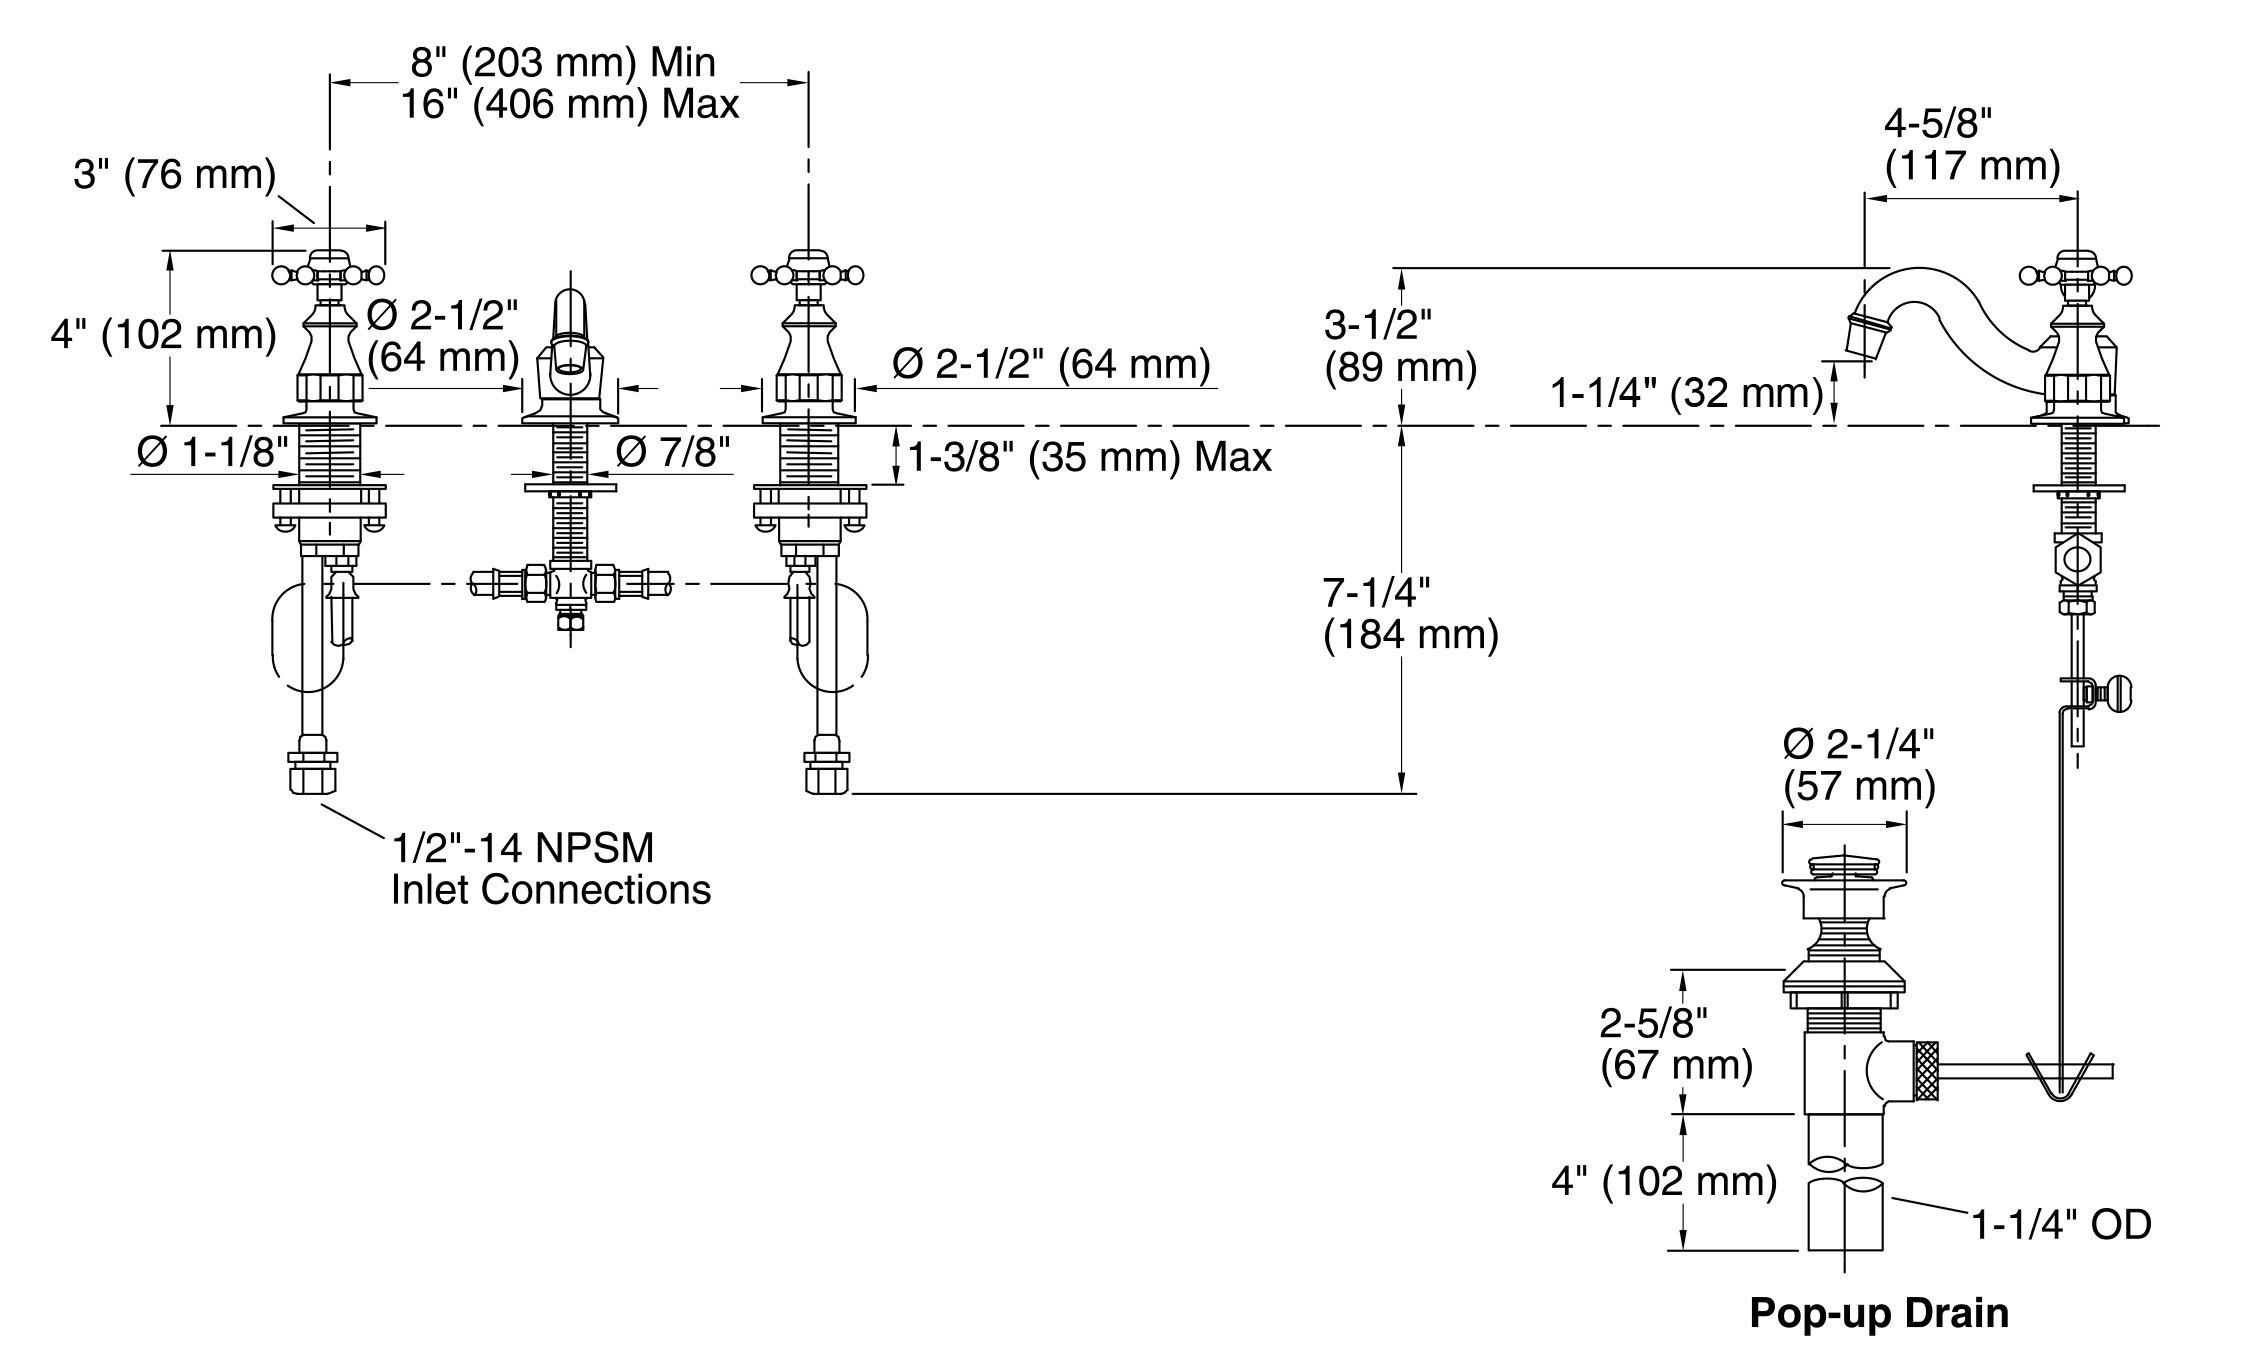 American Standard Faucet Parts Diagram Extraordinary American Standard Kitchen Faucet Parts Diagram Of American Standard Faucet Parts Diagram